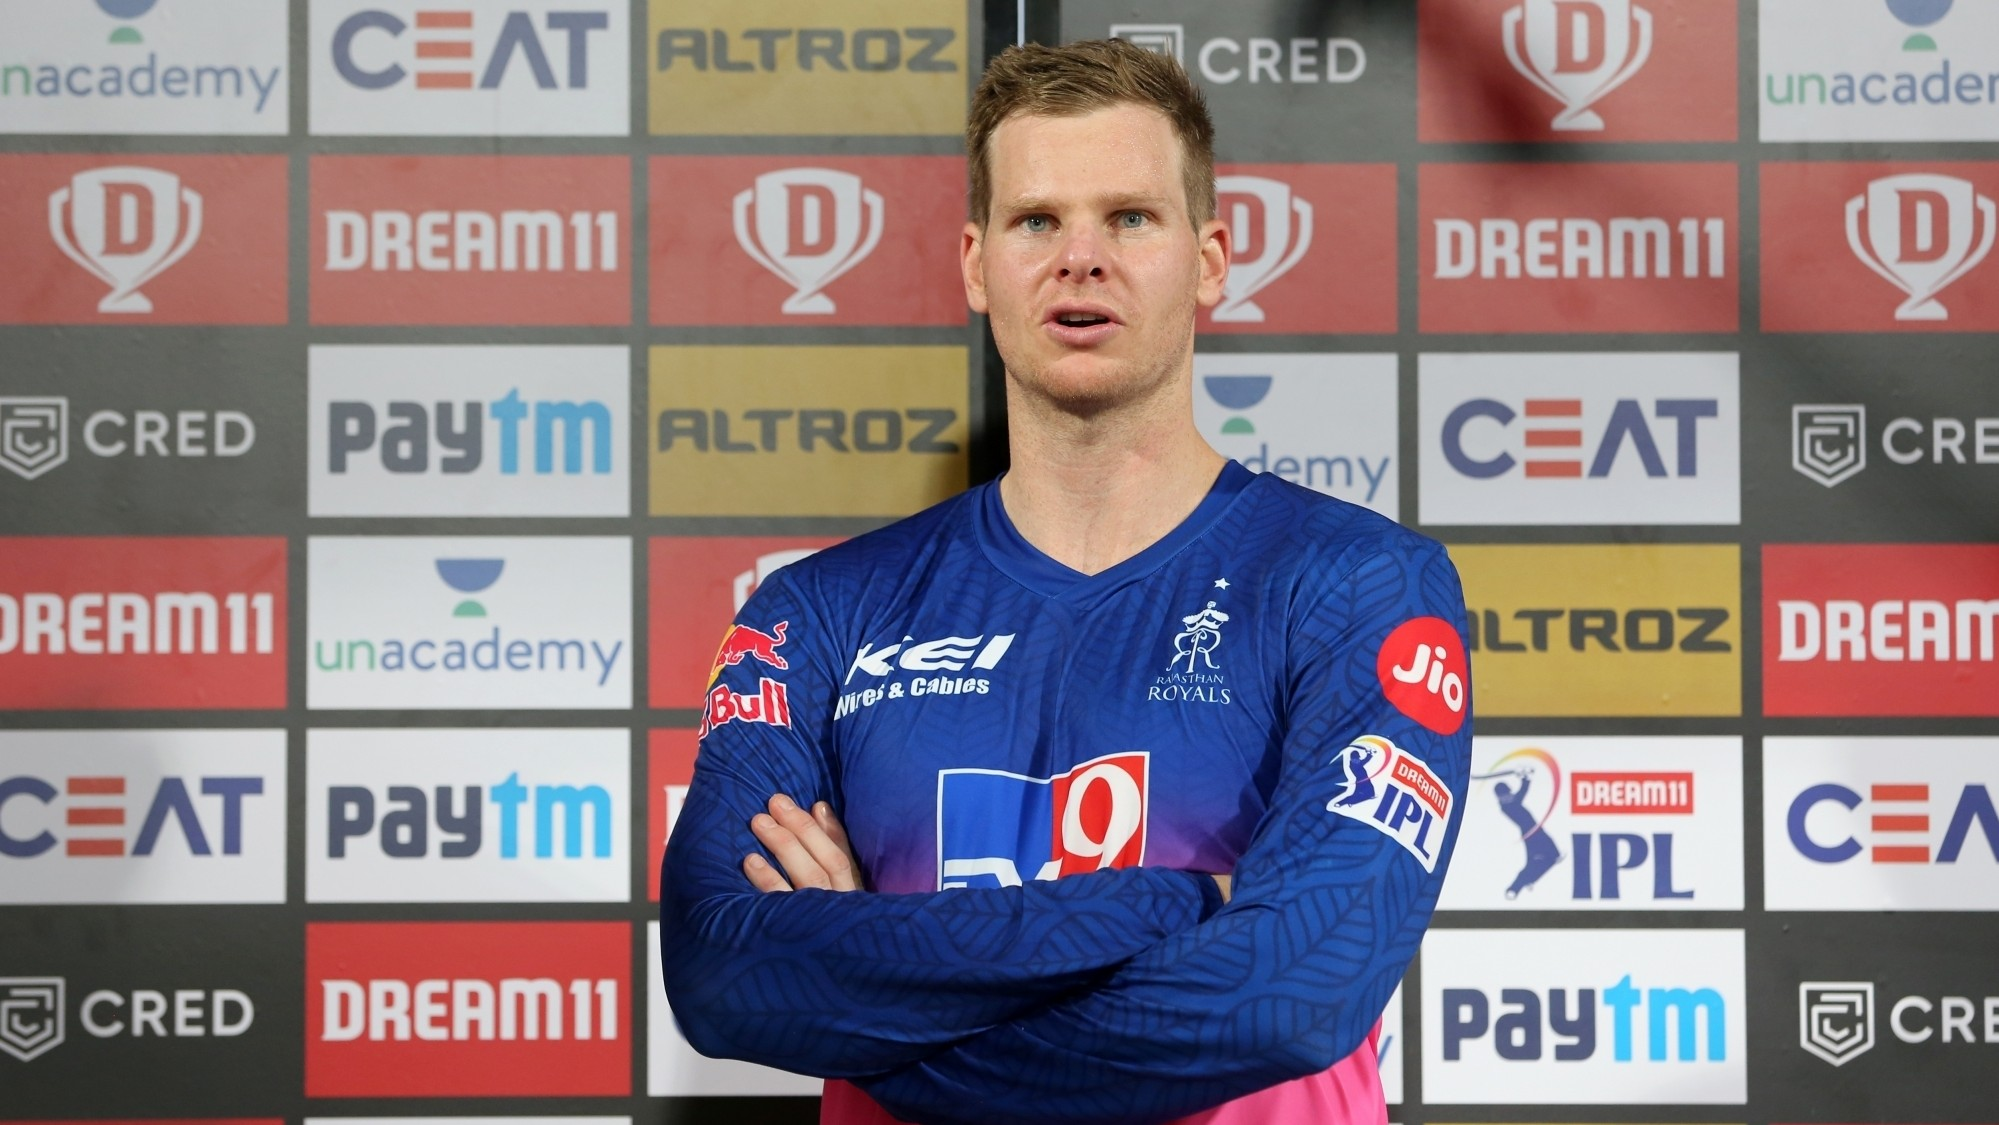 IPL 2020: RR skipper Steve Smith fined INR 12 lakhs for slow over-rate against MI